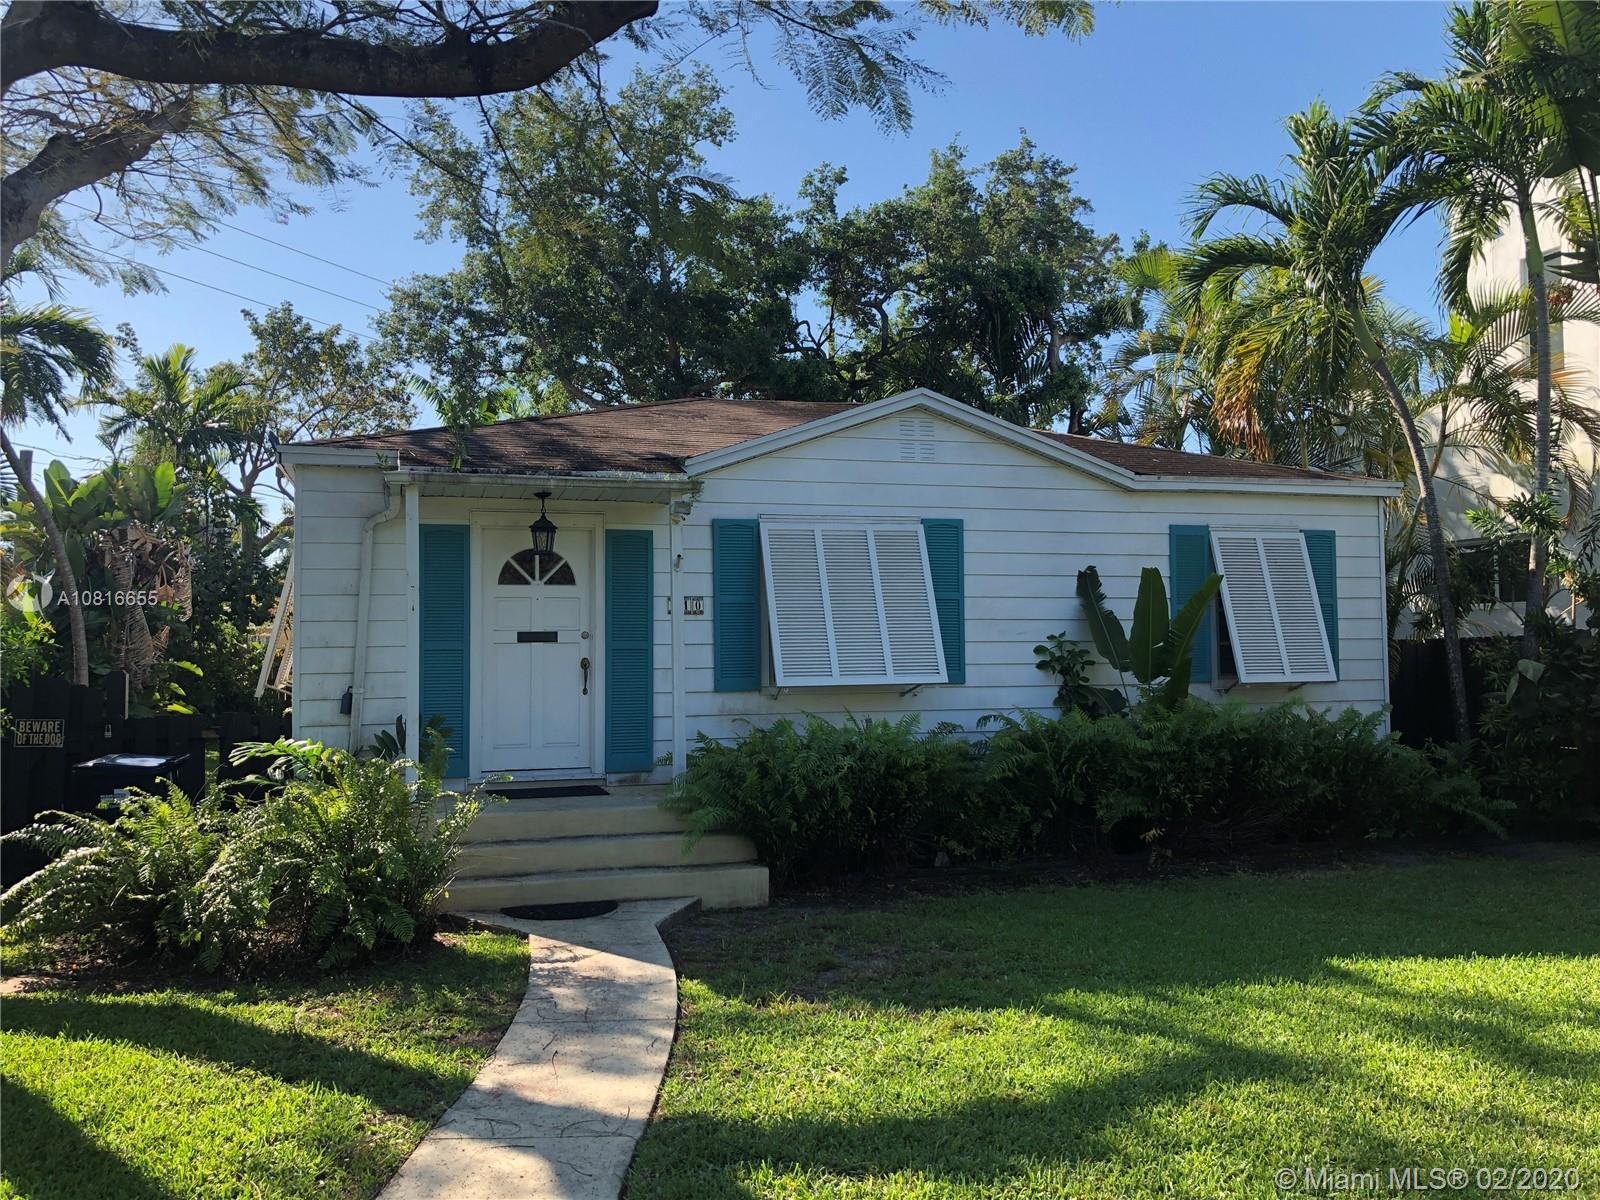 210 S Melrose Dr, Miami Springs, FL 33166